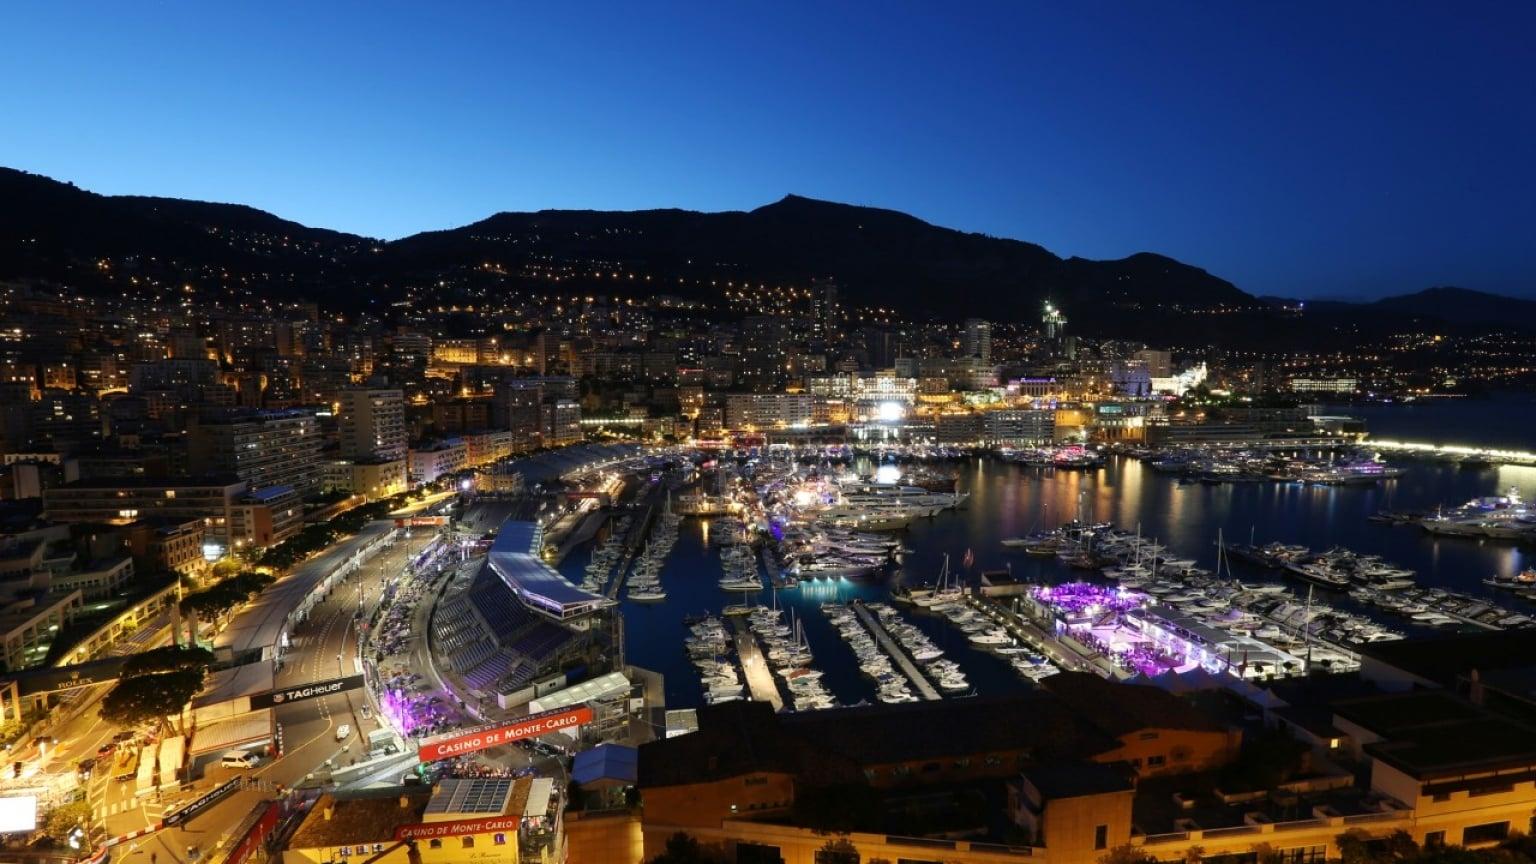 Monte Carlo Theme